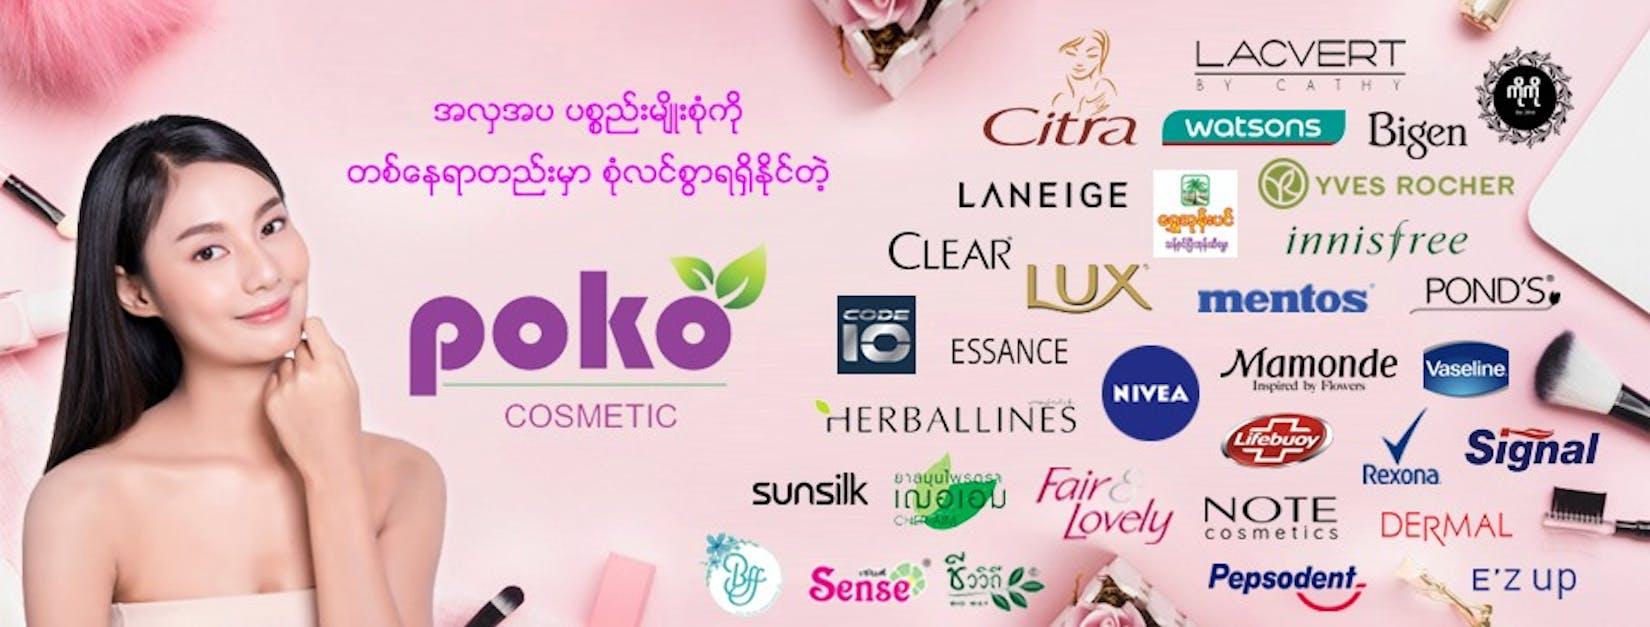 Poko Cosmetics | Beauty